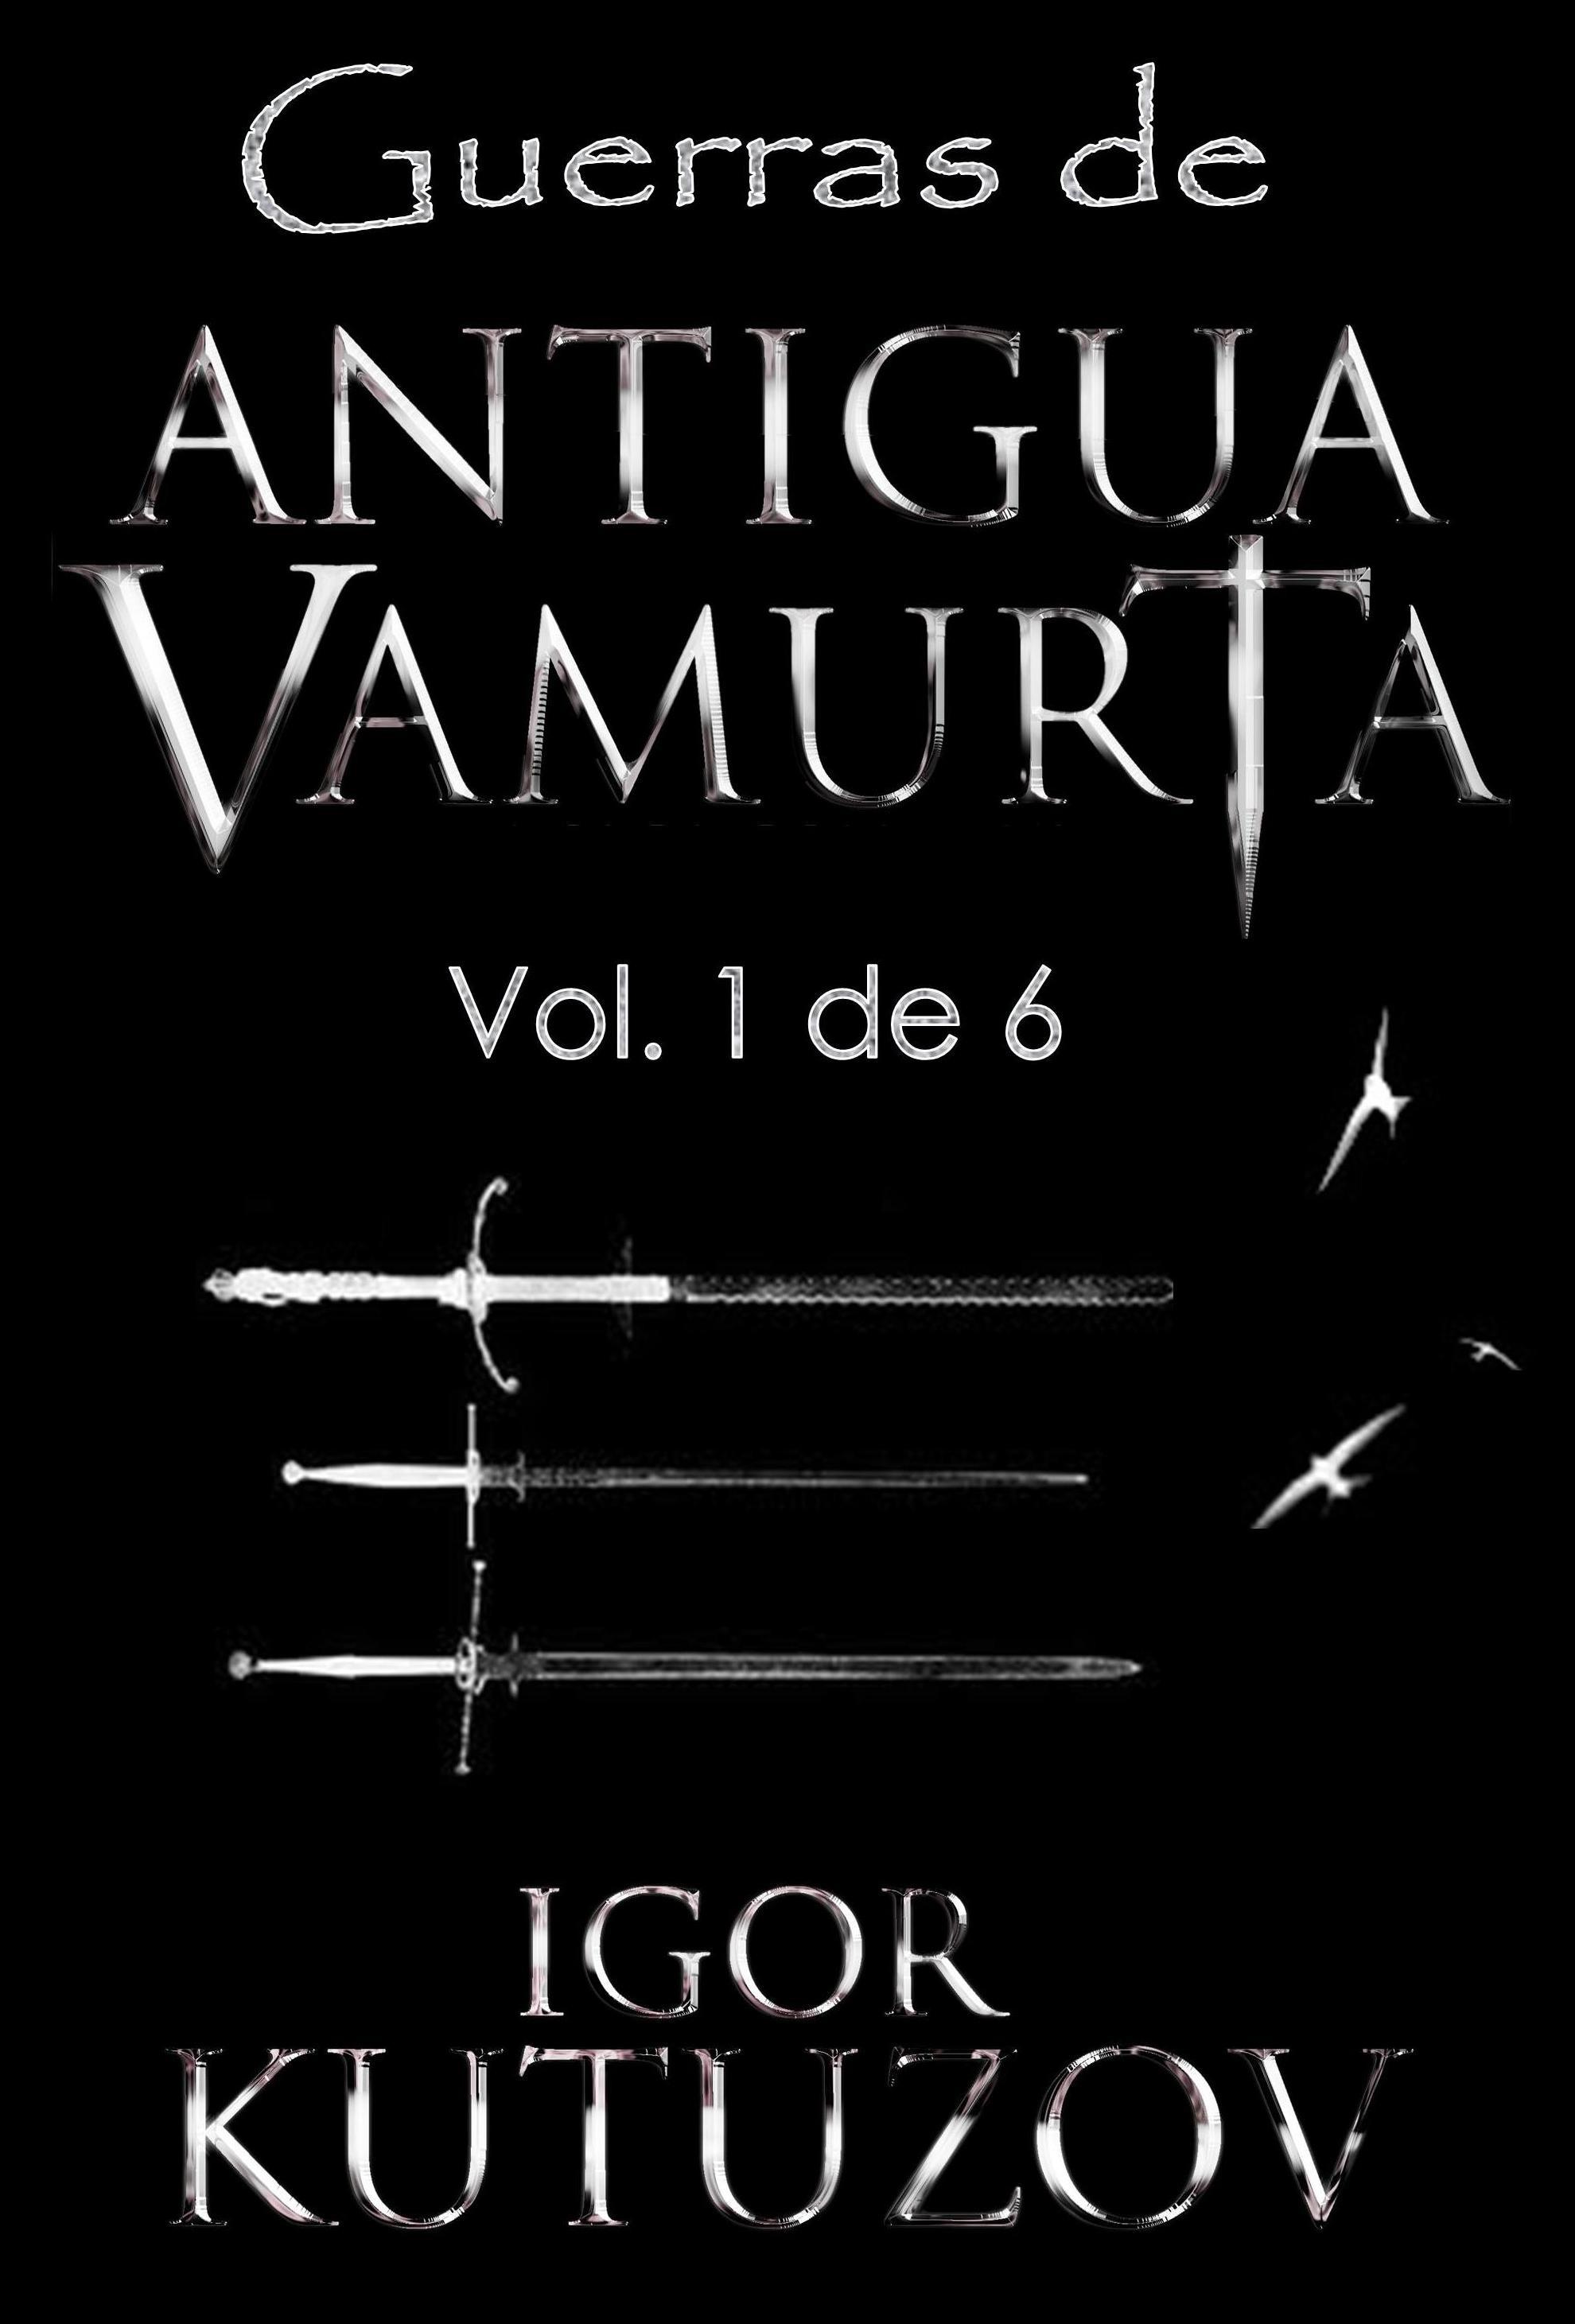 Guerras de Antigua Vamurta, Vol. 1